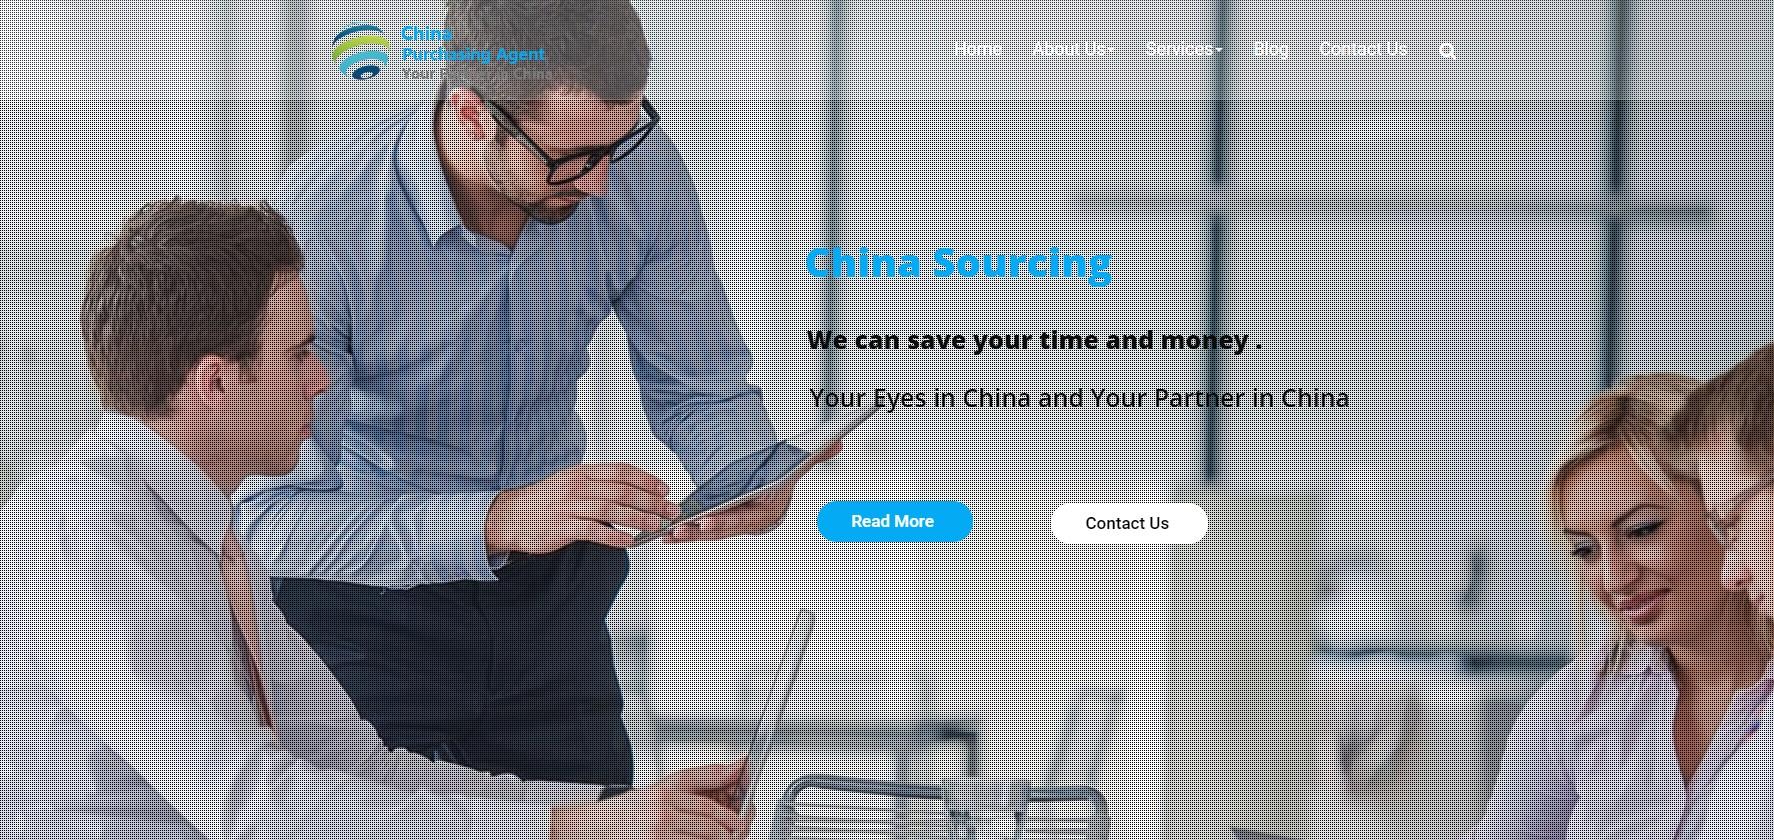 china-sourcing-shenzhen agent